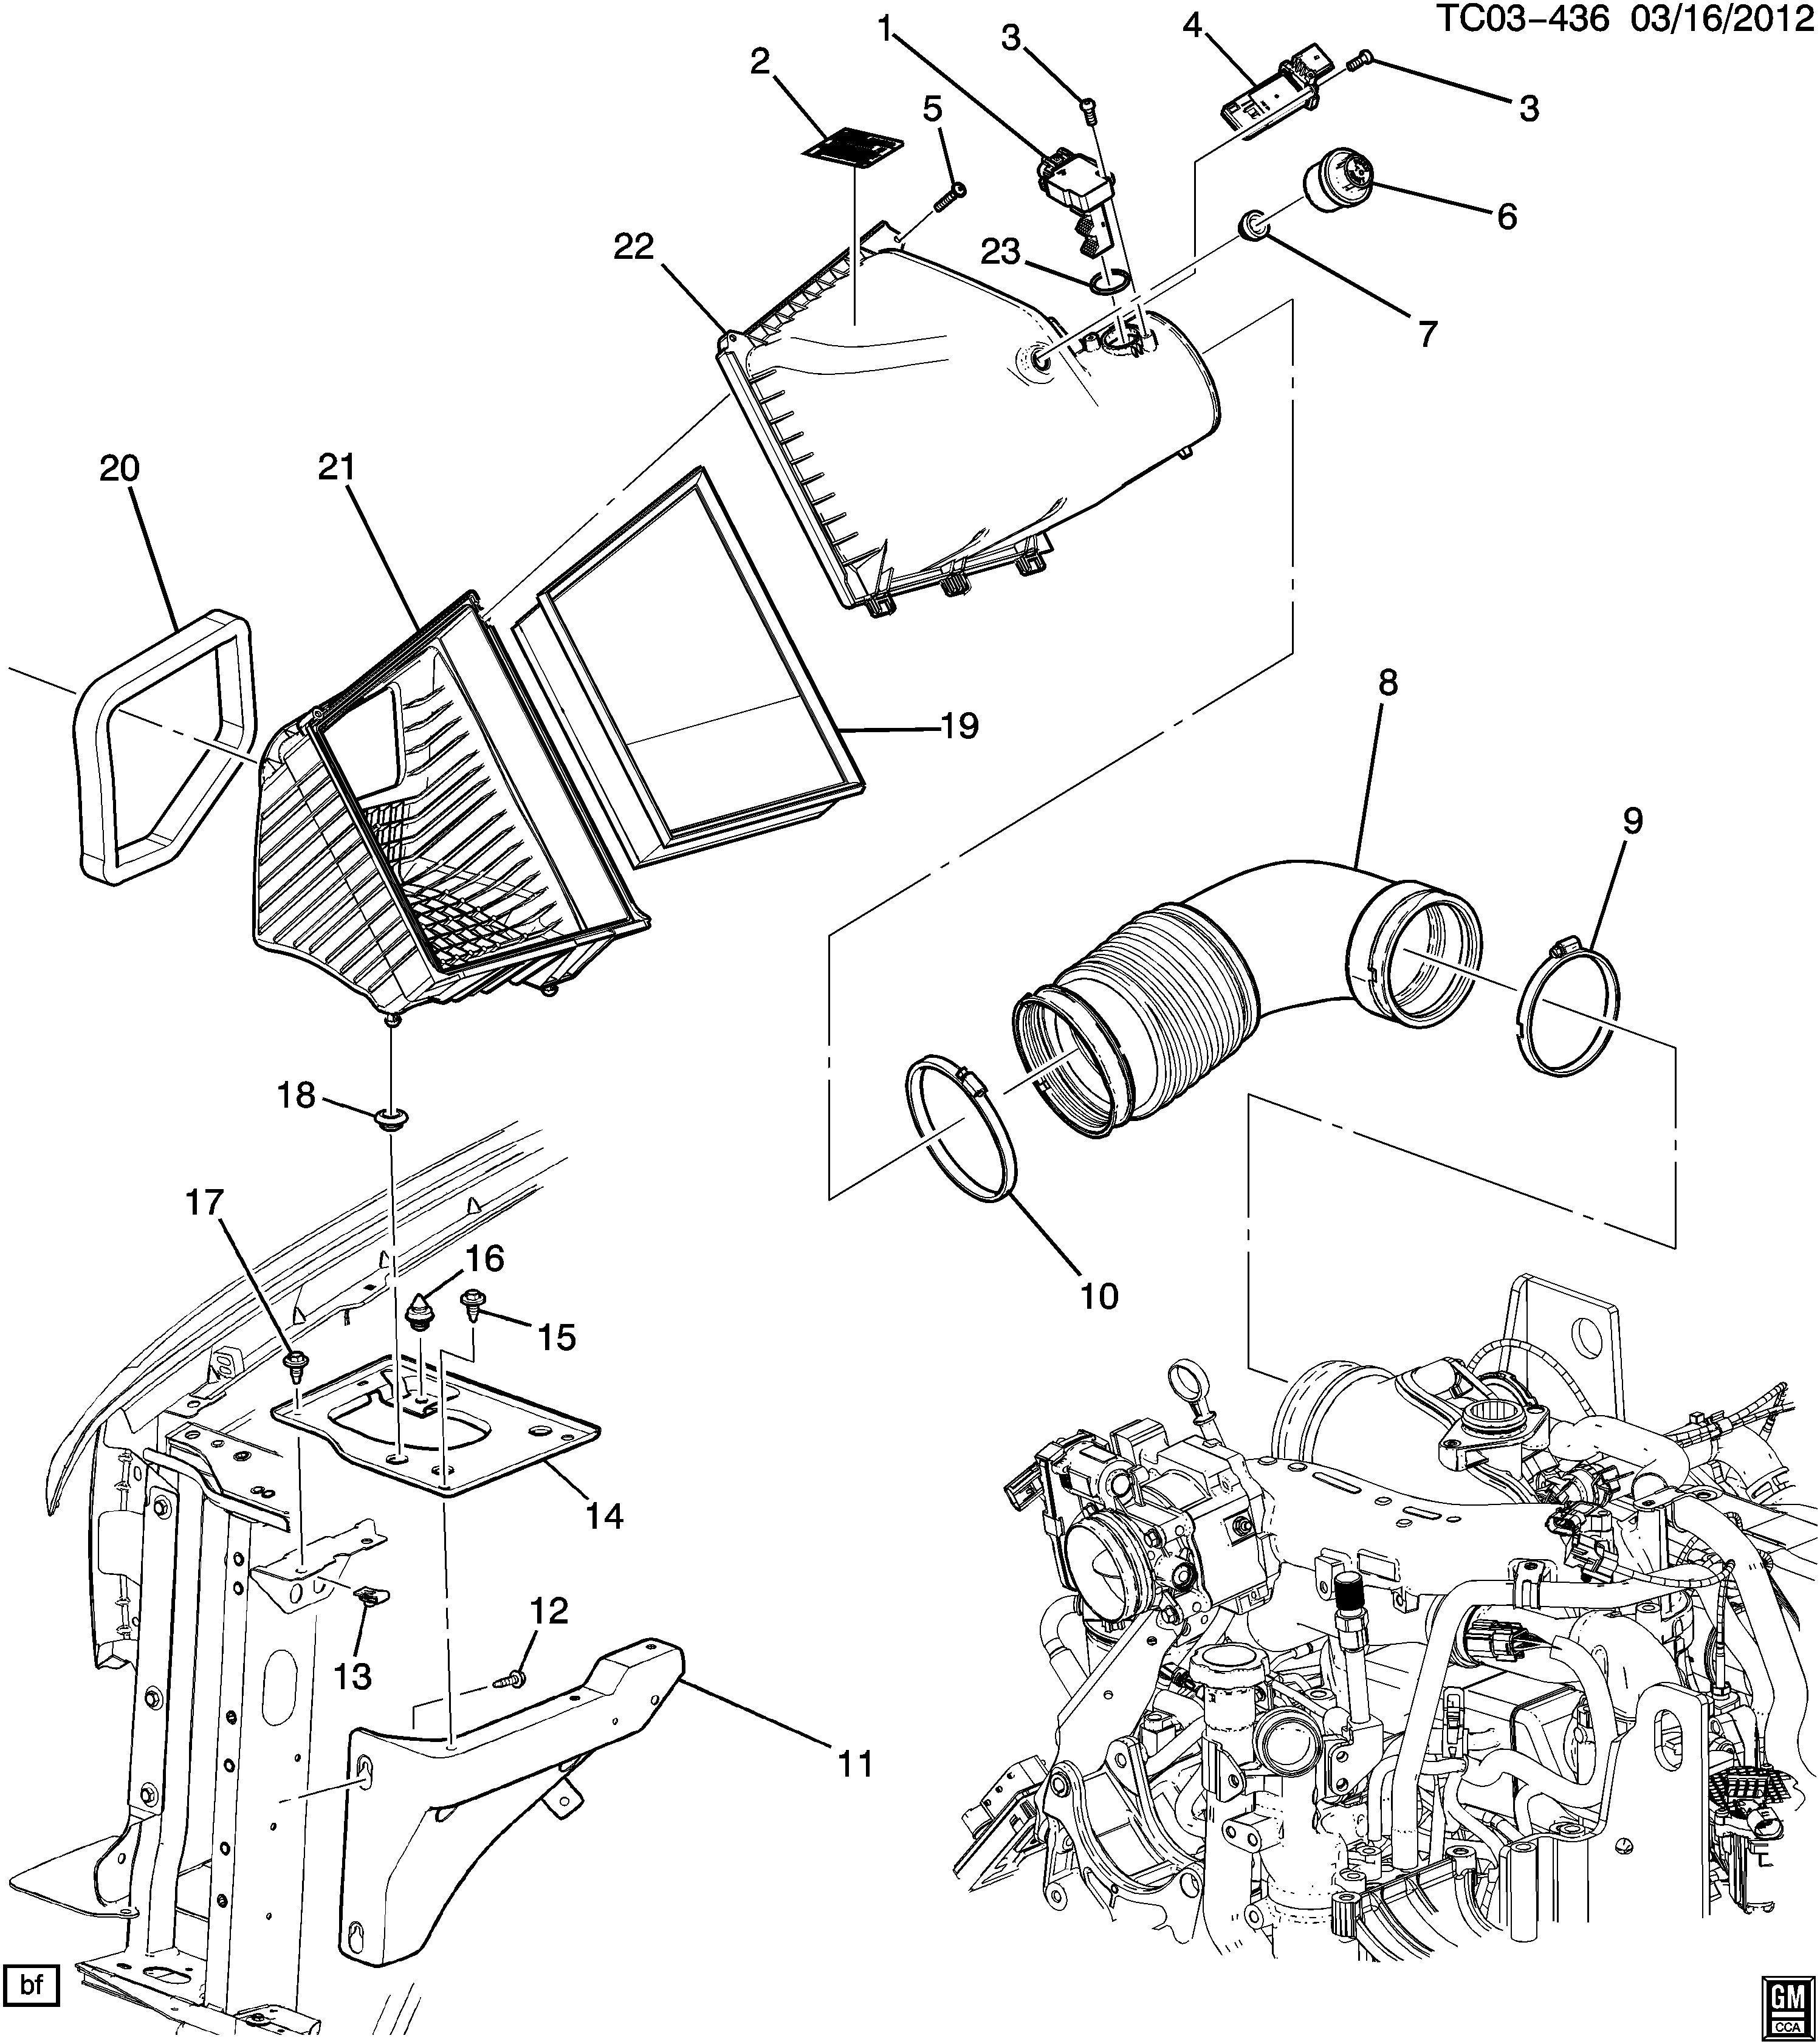 Chevrolet Silverado Bolt Screw Boltacl Boltelement